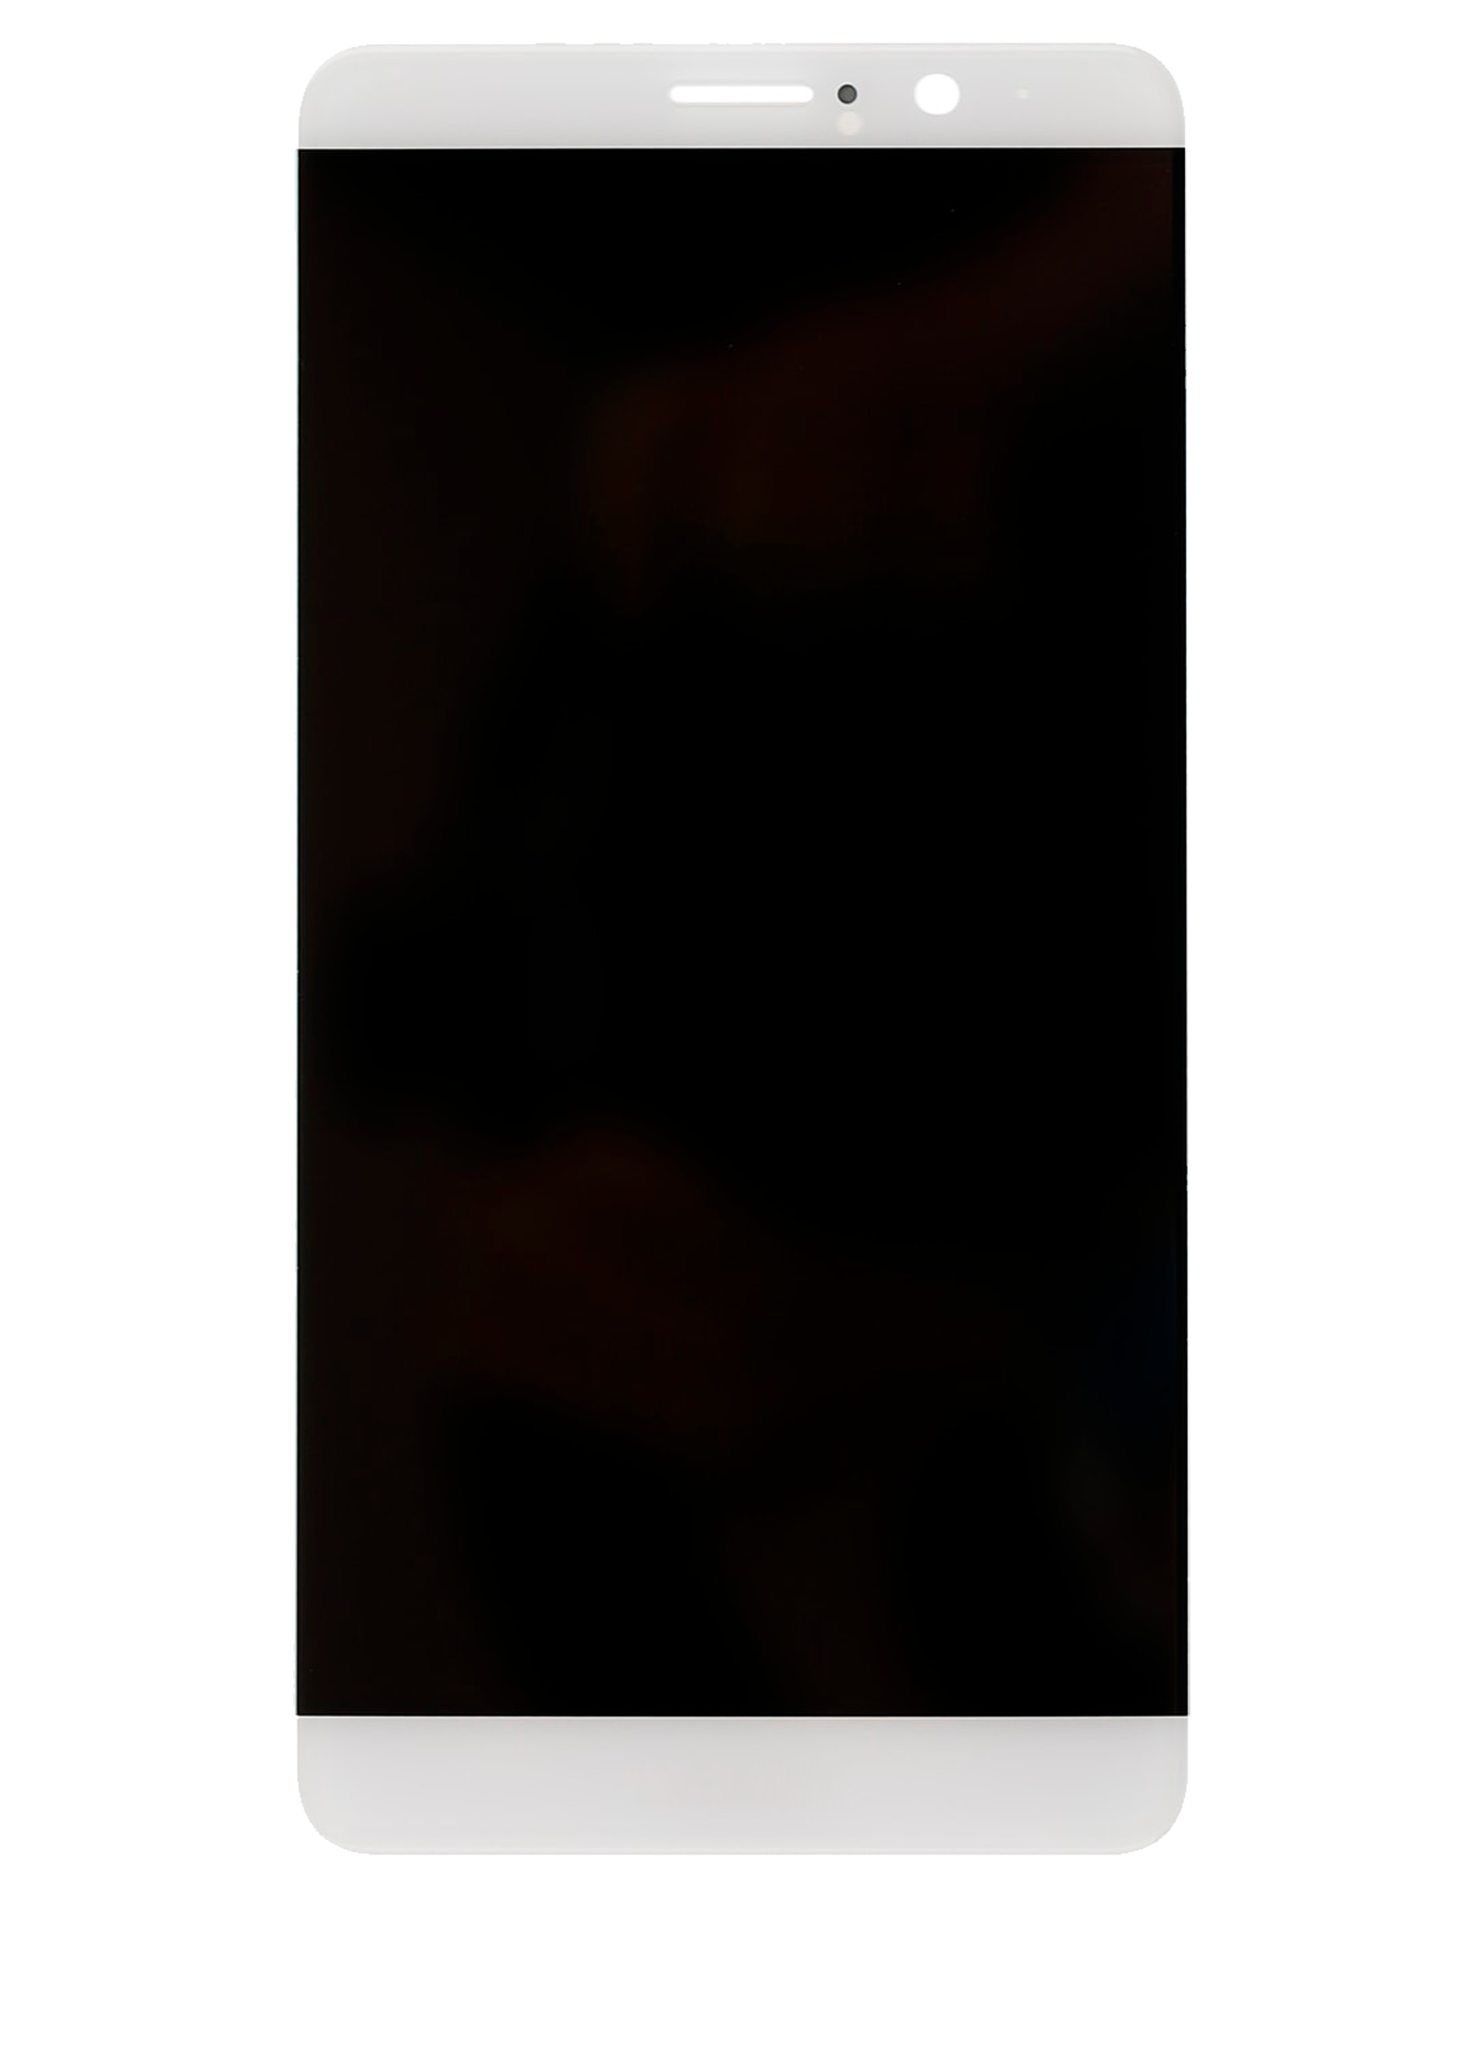 Huawei Mate 9 MHA-L09 Display Module + Frame White Original